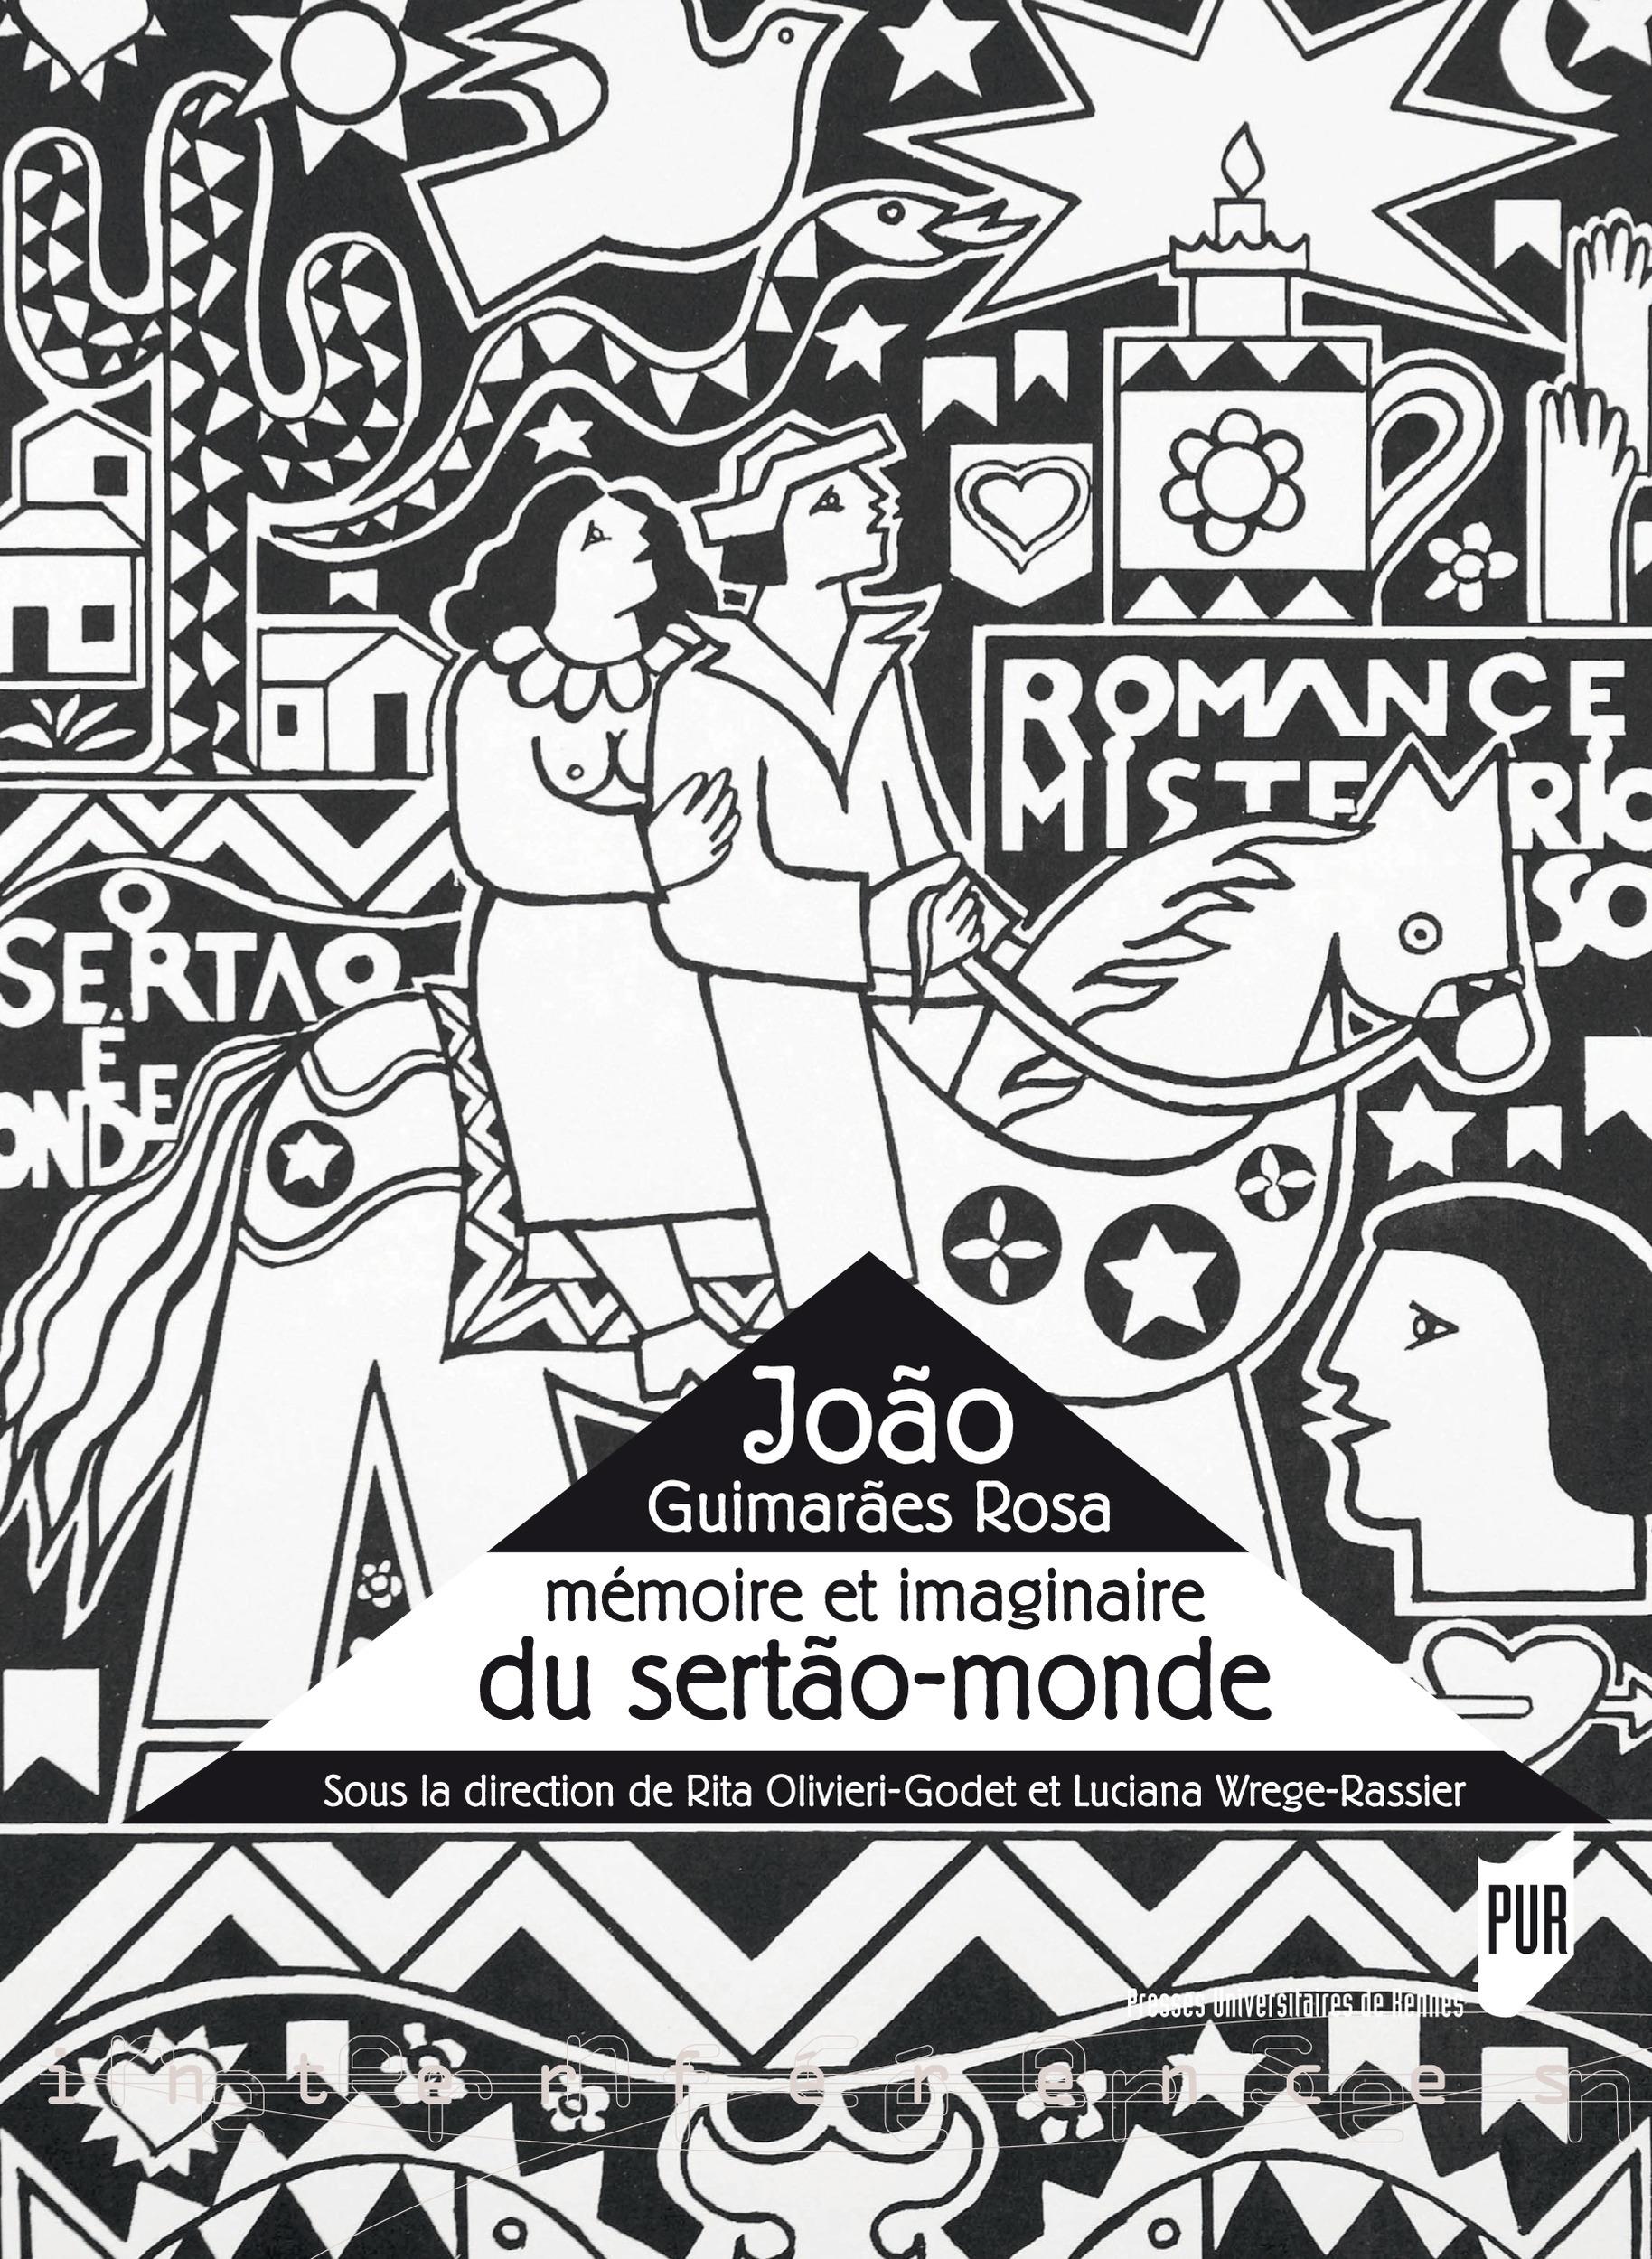 João Guimarães Rosa  - Luciana Wrege-Rassier  - Rita Olivieri-Godet